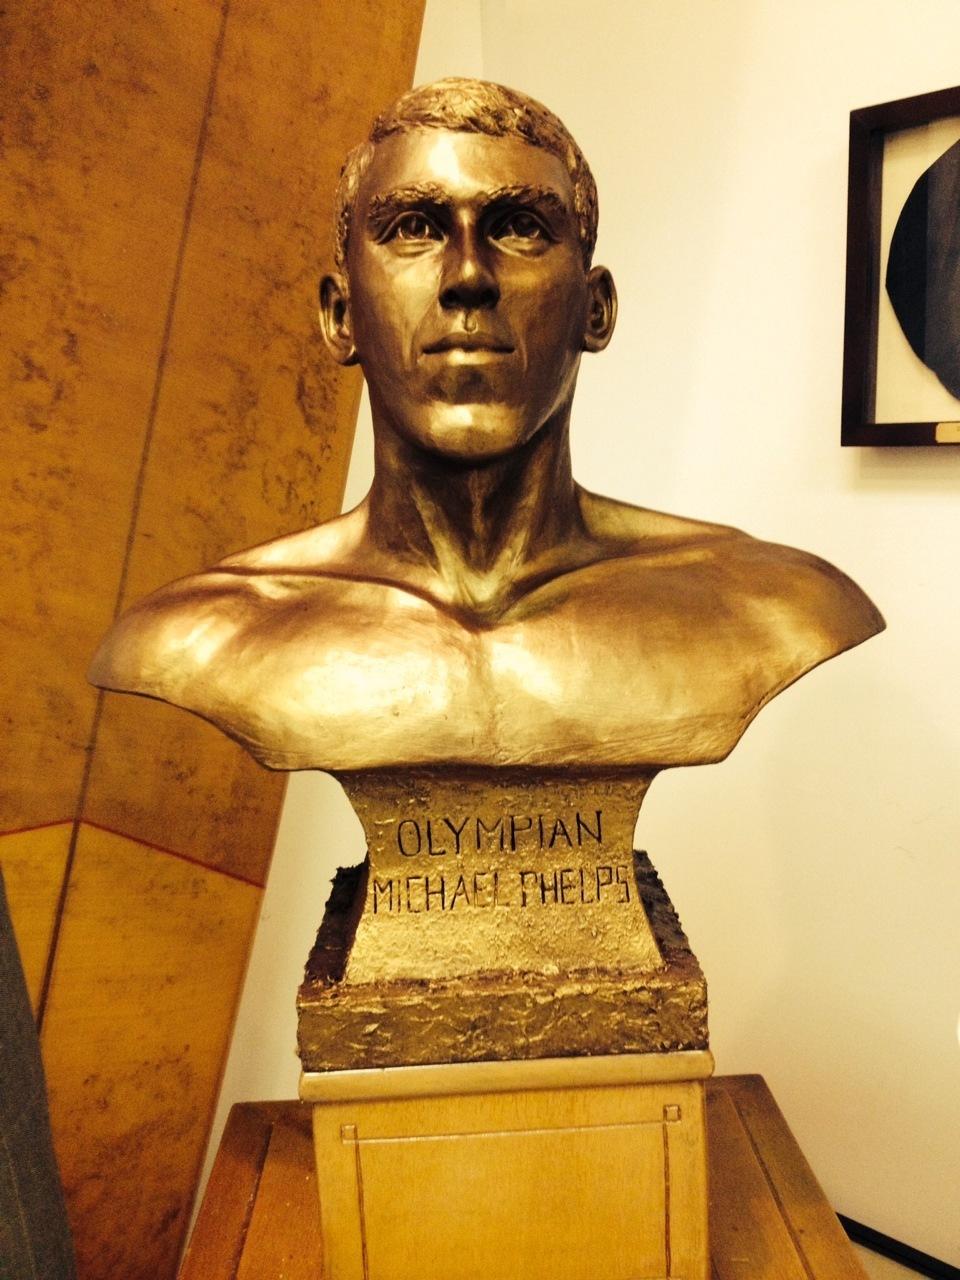 Michael Phelps Statue Put On Display At International